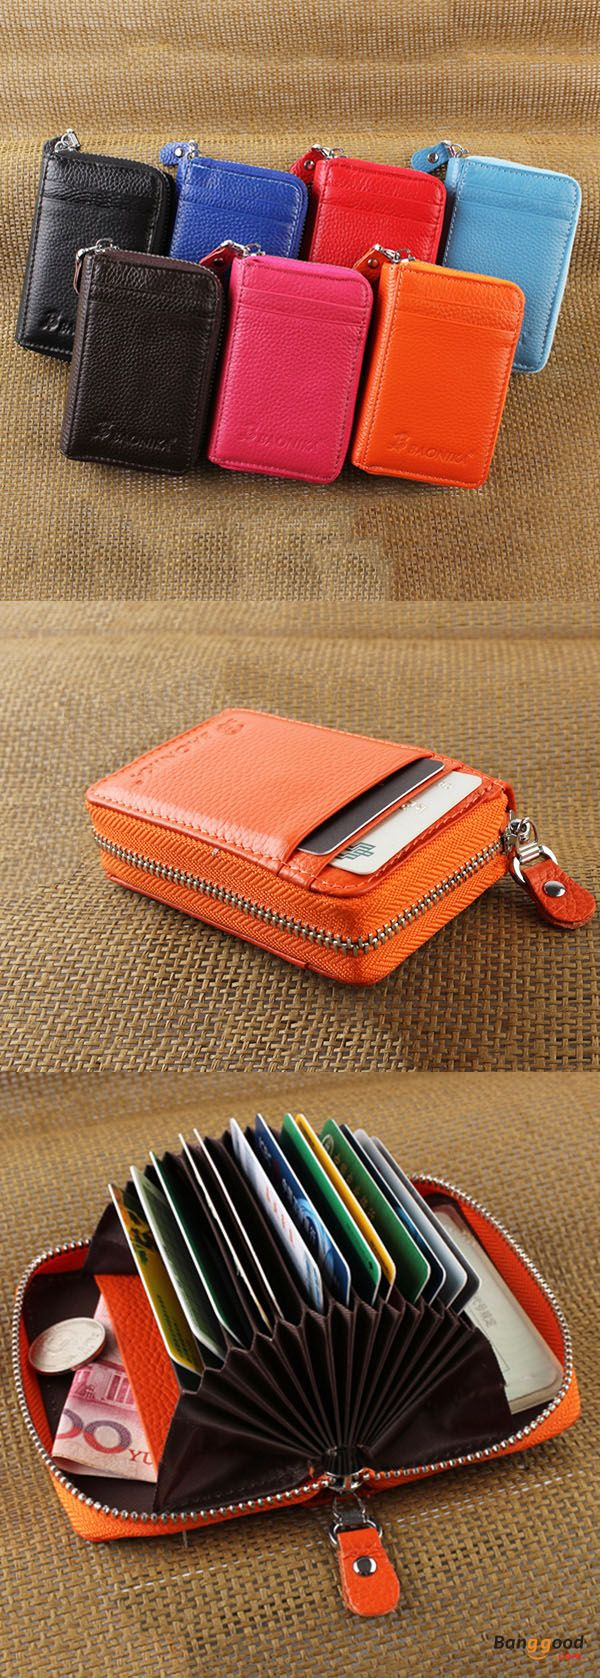 110 Best Bolsos Images On Pinterest Backpacks Fashion Handbags Nucelle Women Leather Purse Satchel Shoulder Bag Handbag Lock Gorgeous Glitter Elegant Blue Portable Short Coin Bags